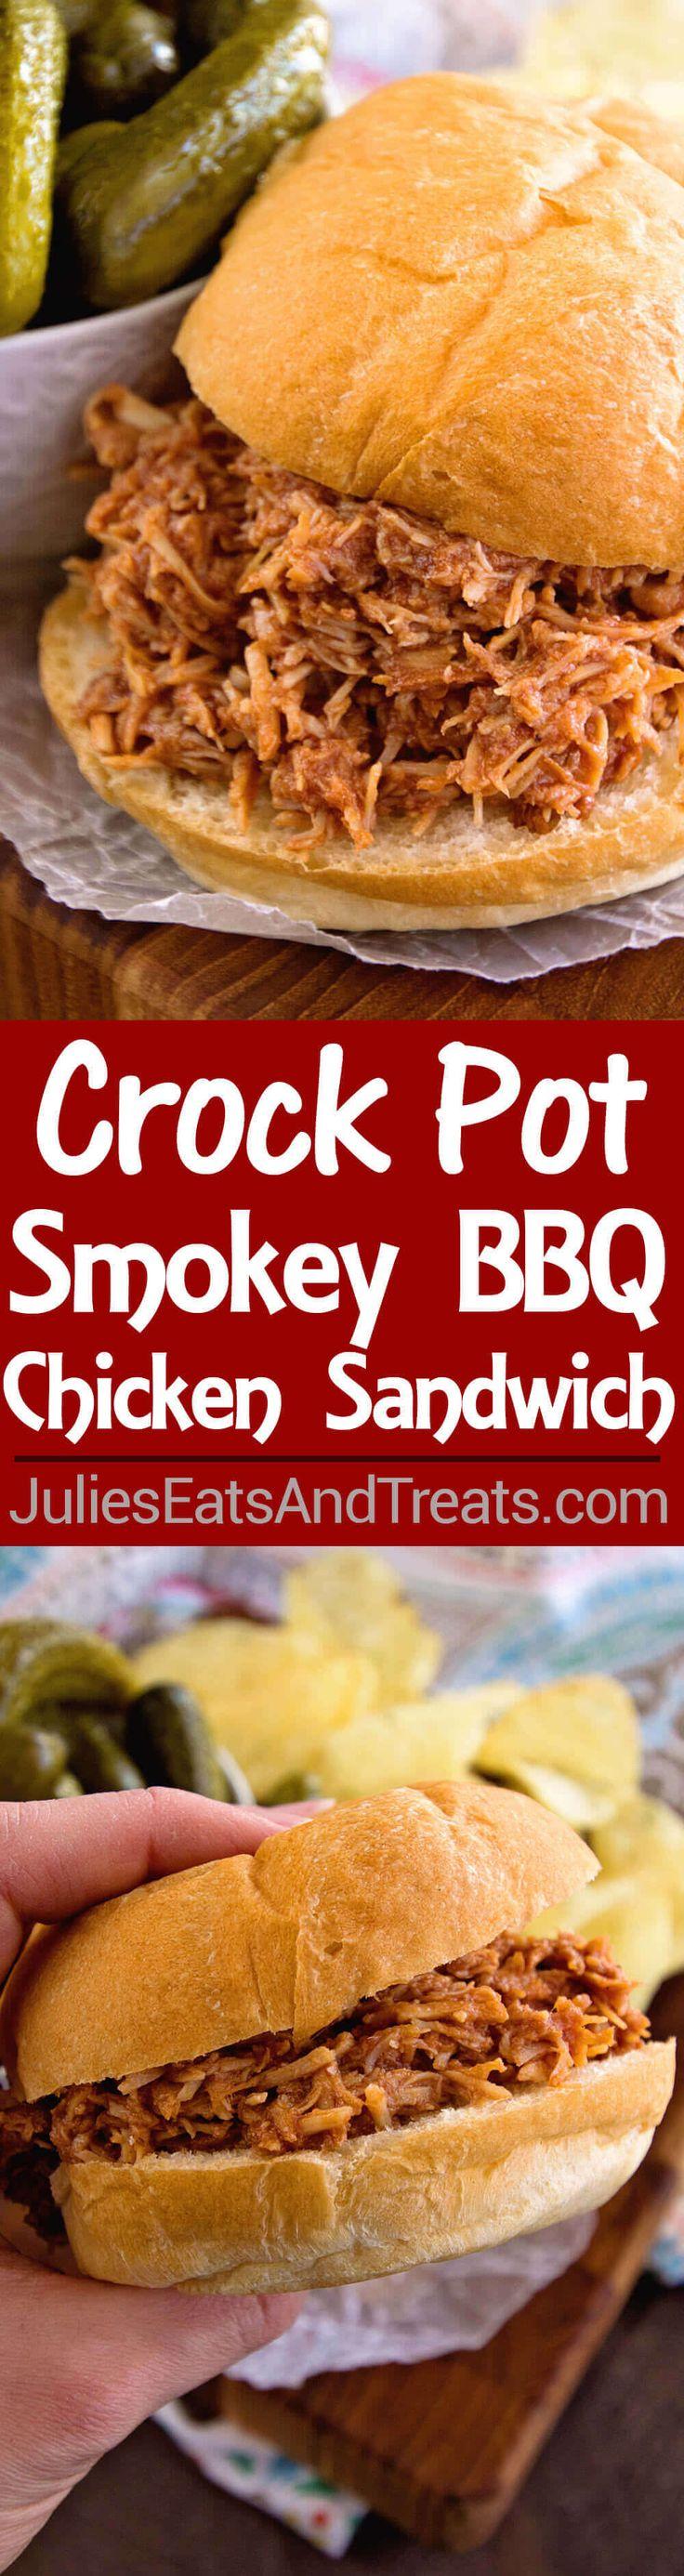 Crock Pot Smokey BBQ Shredded Chicken Sandwiches~ Easy, Shredded Chicken…